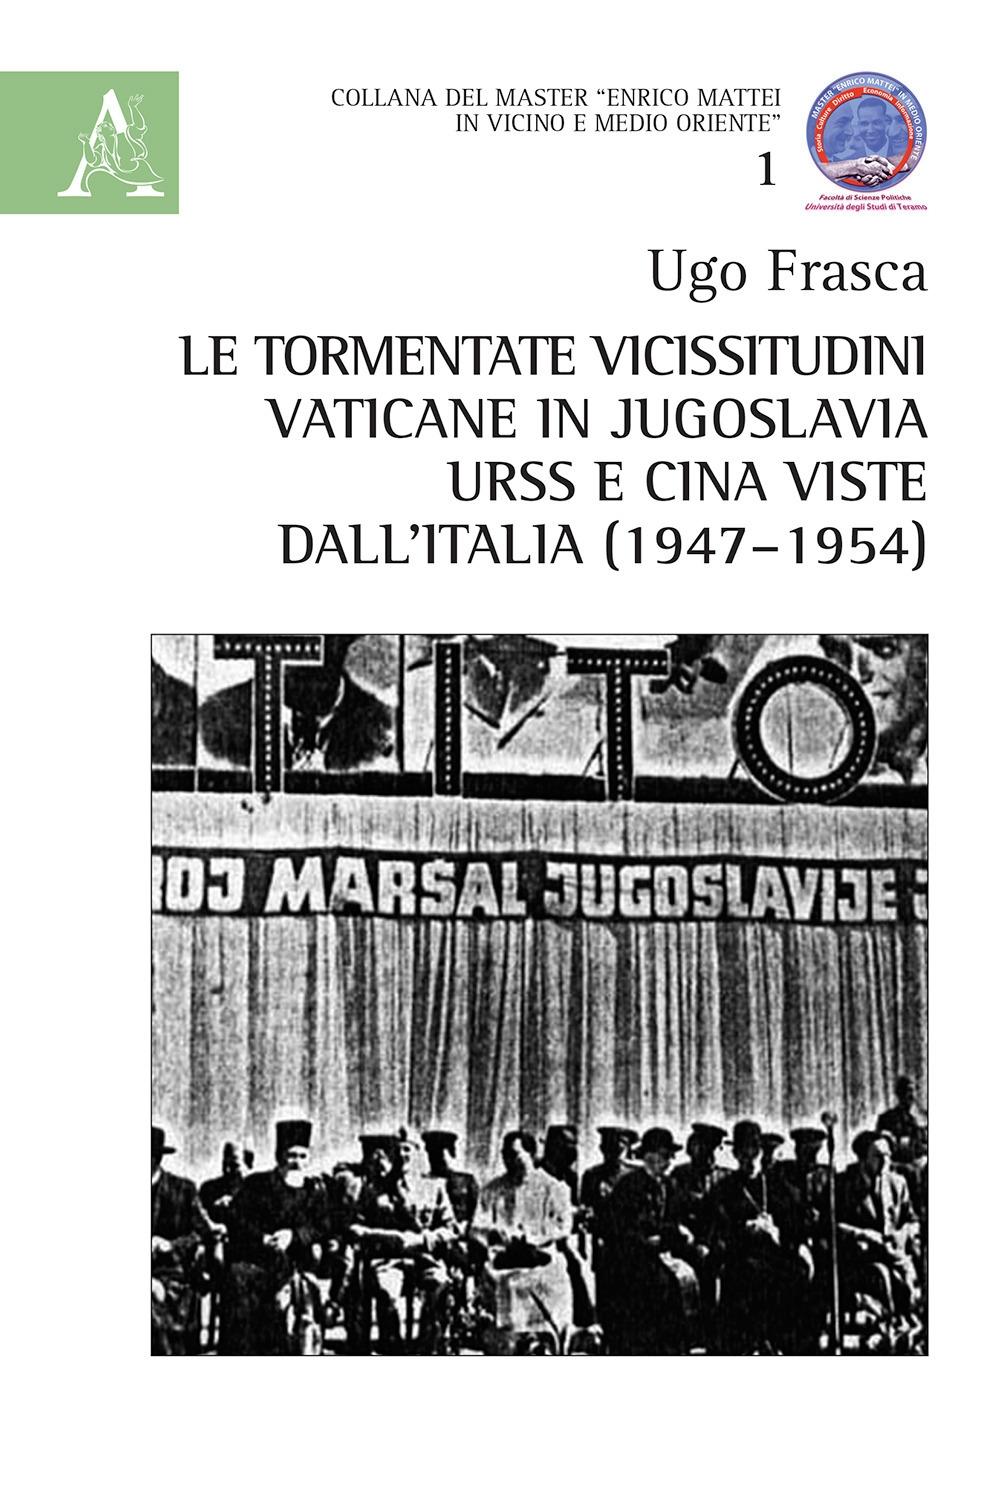 Le tormentate vicissitudini vaticane in Jugoslavia, URSS e Cina viste dall'Italia (1947-1954)